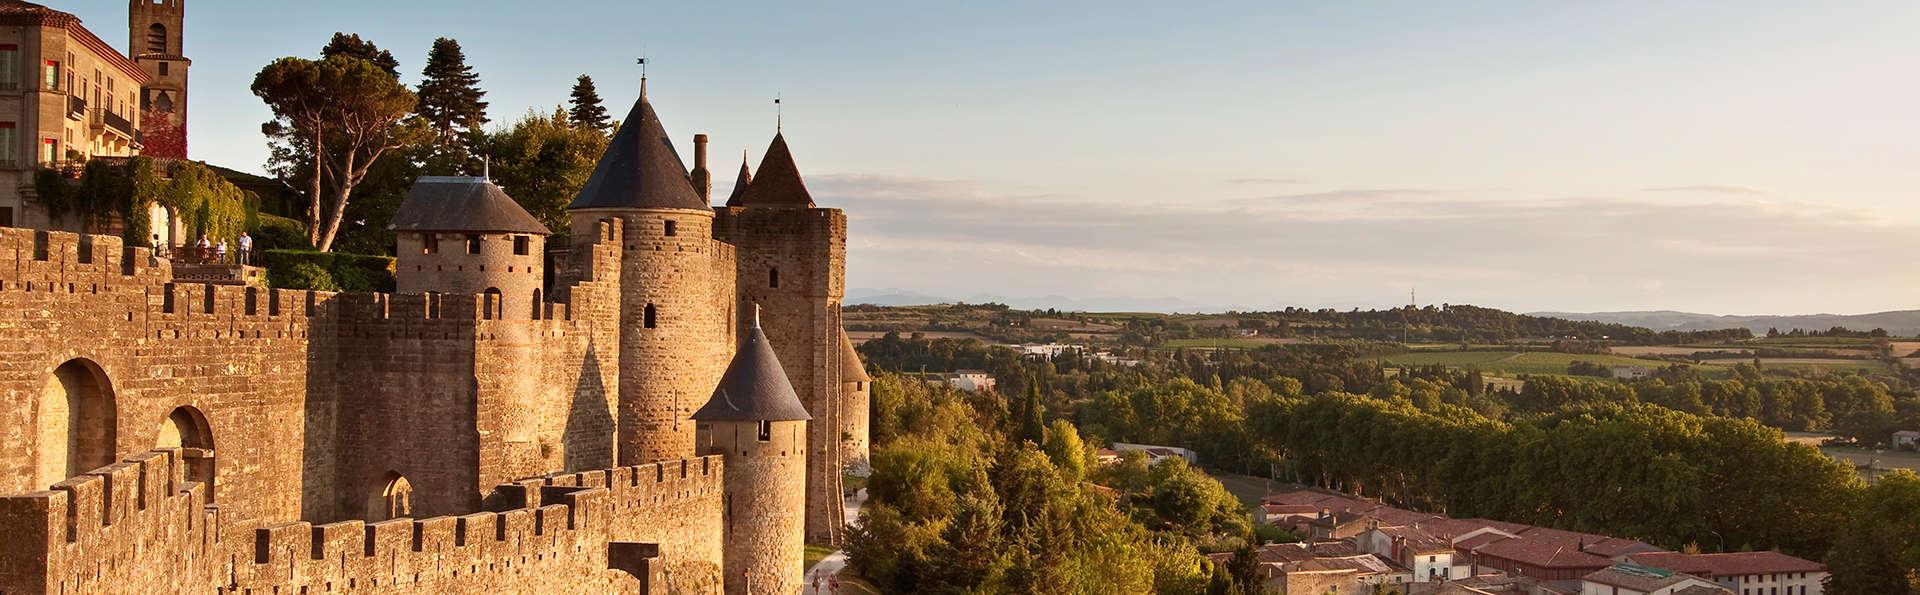 pont rouge carcassonne